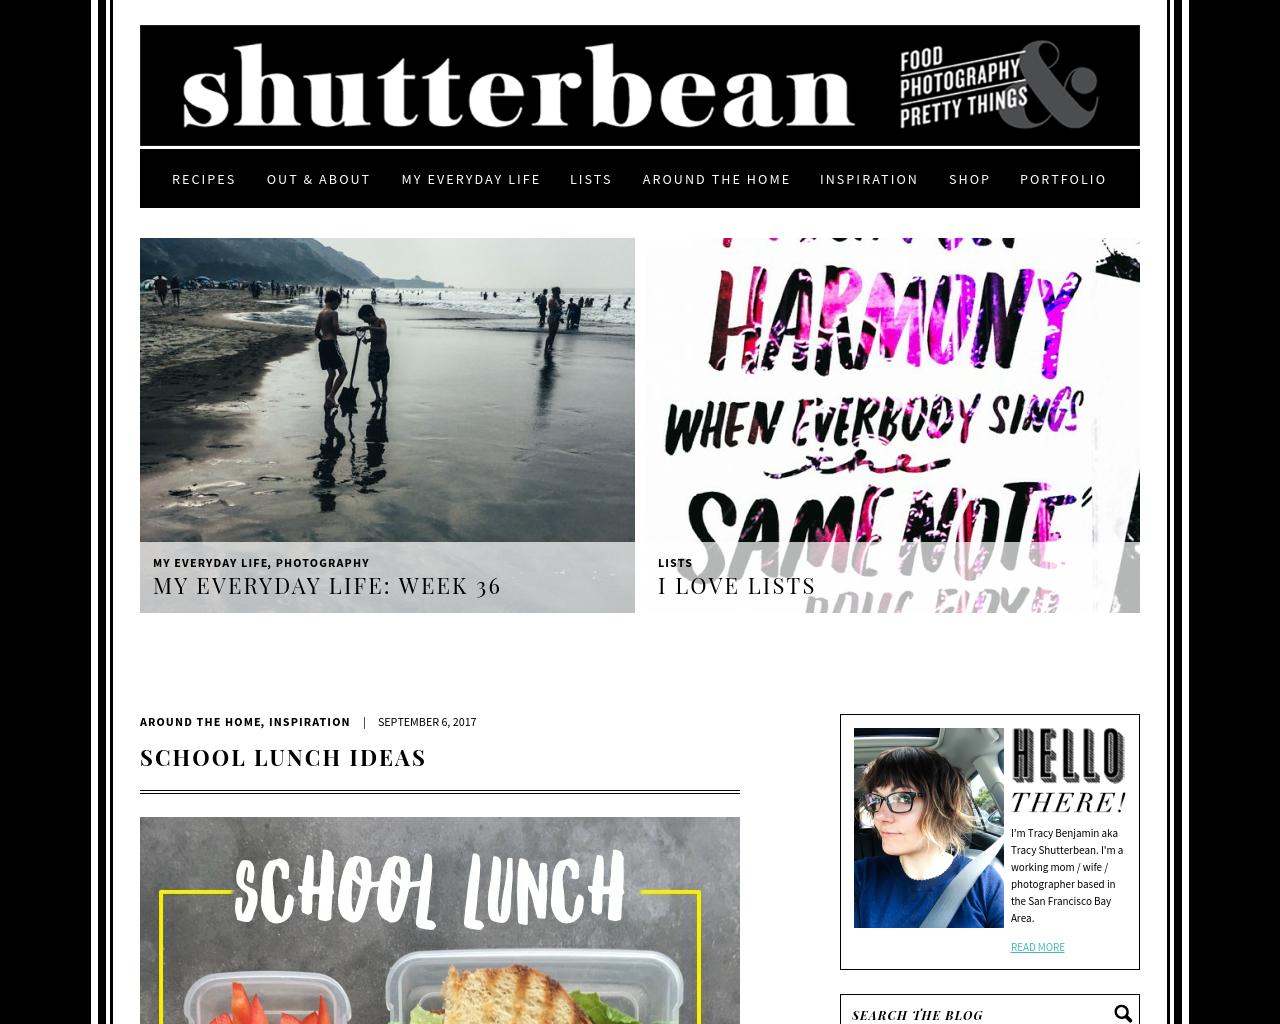 Shutterbean-Advertising-Reviews-Pricing